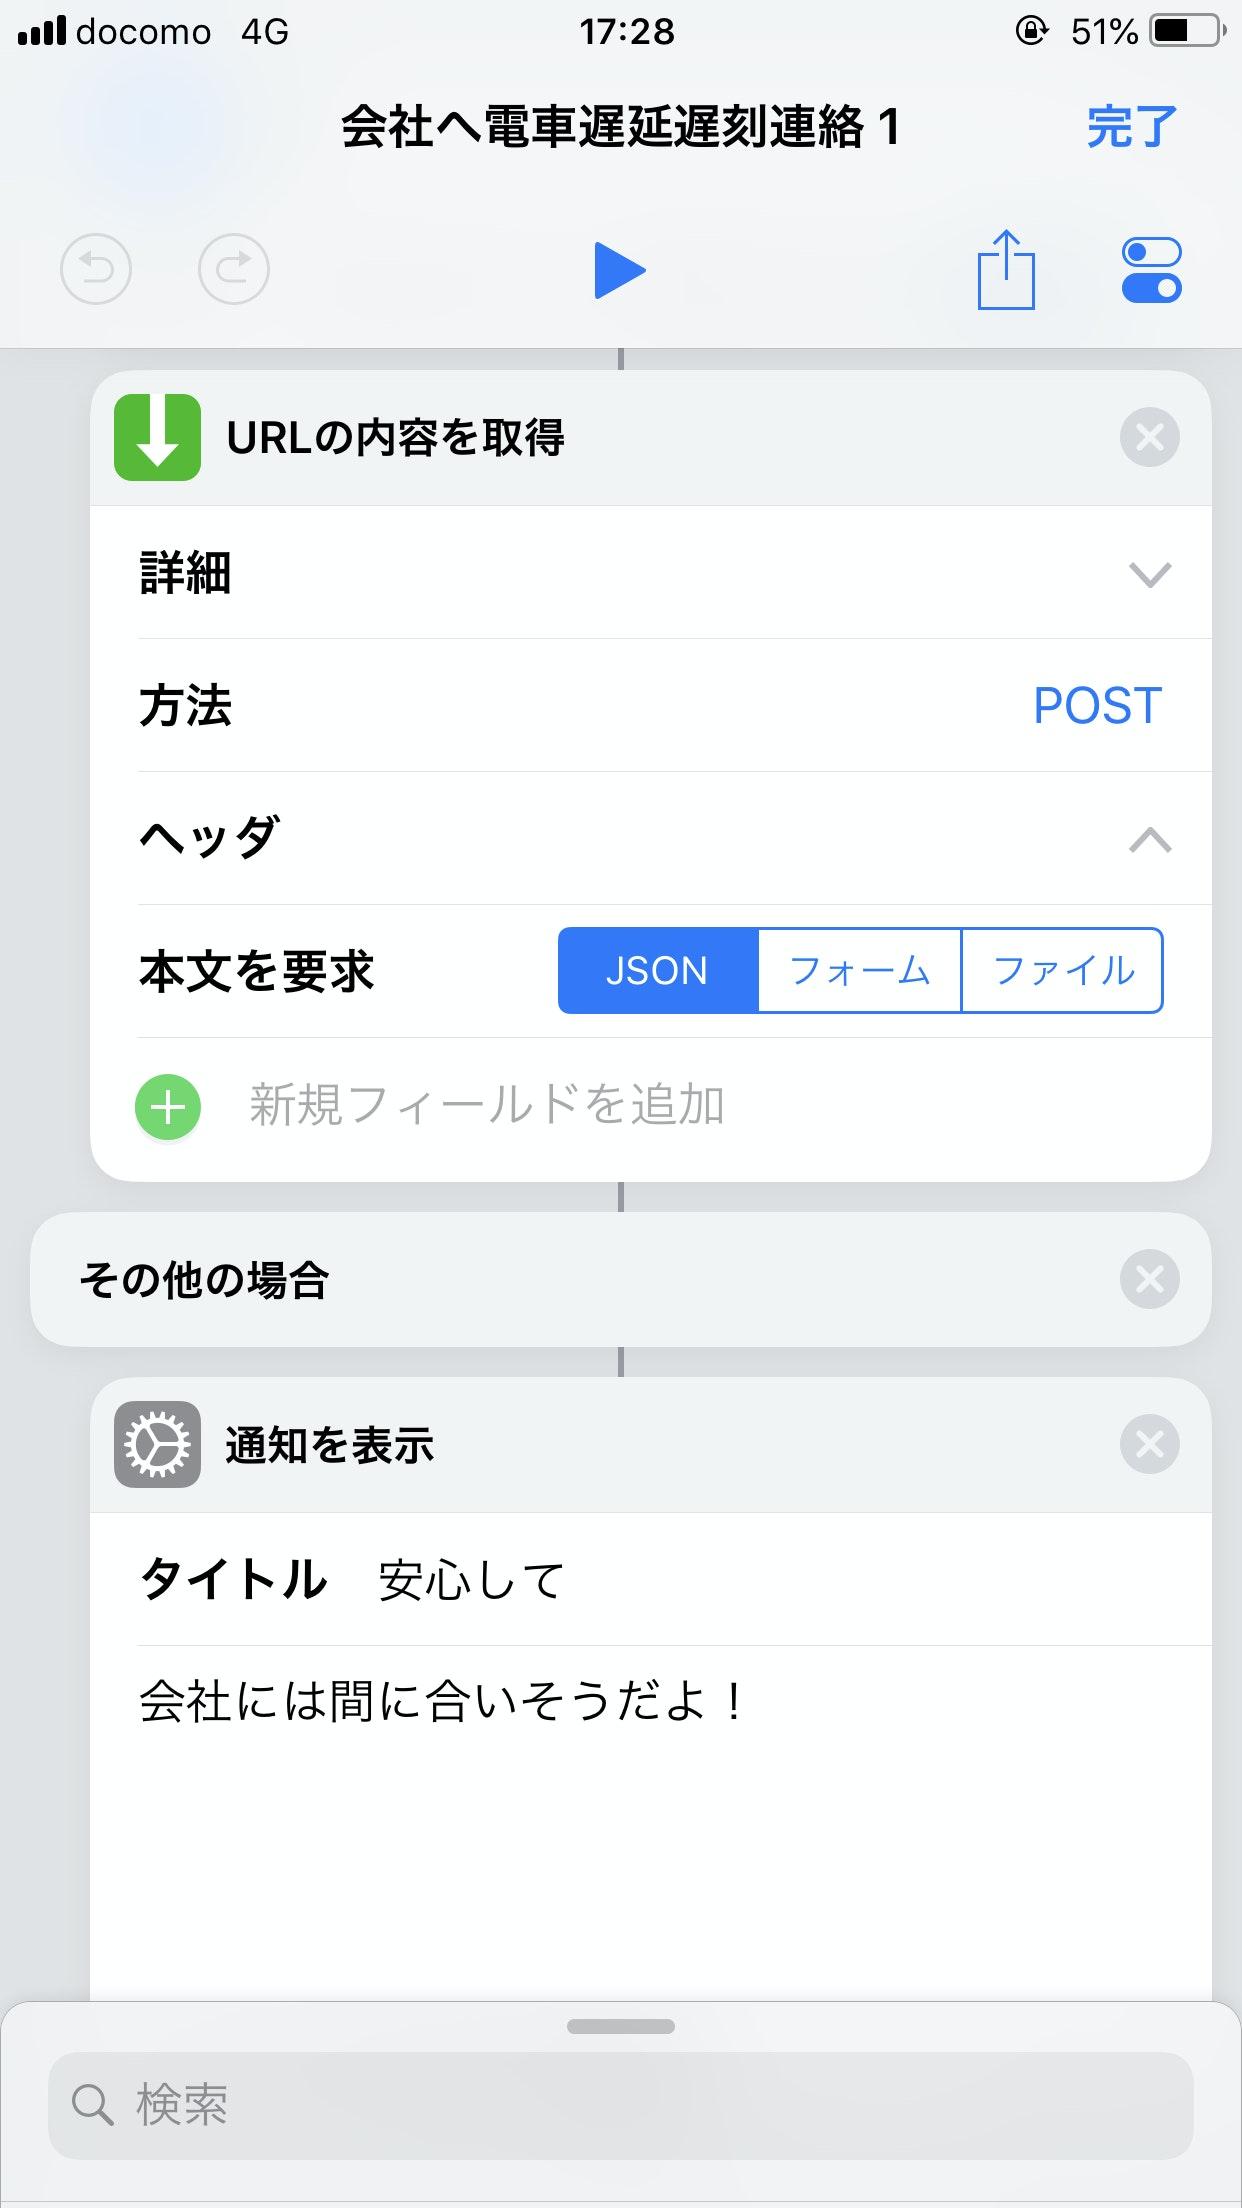 IMG_D9C46578FC0E-1.jpeg